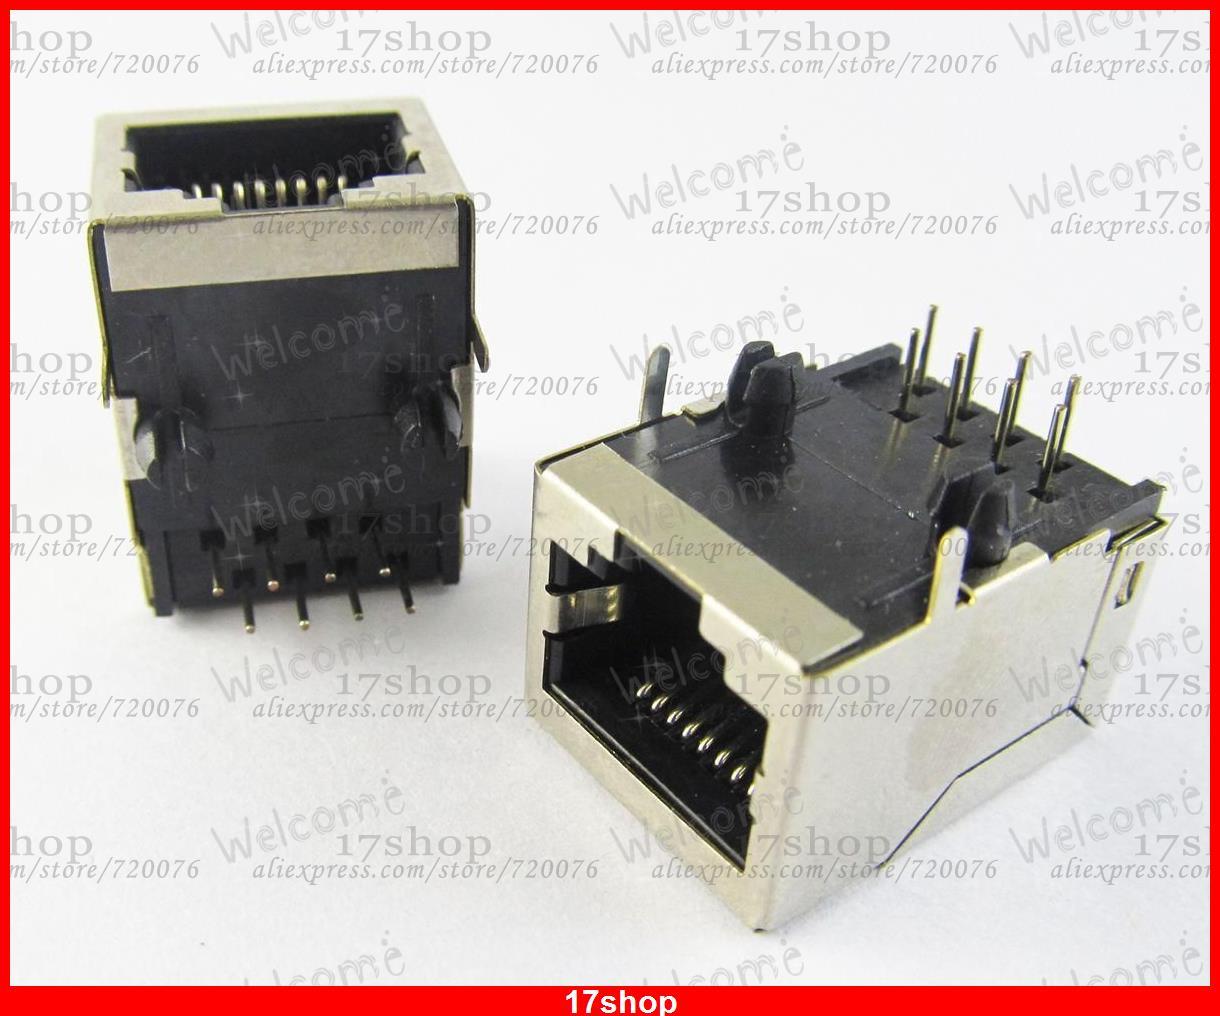 موصل مقبس شبكة LAN ، 100 قطعة ، موصل شبكة معياري RJ45 59 8P8C PCB